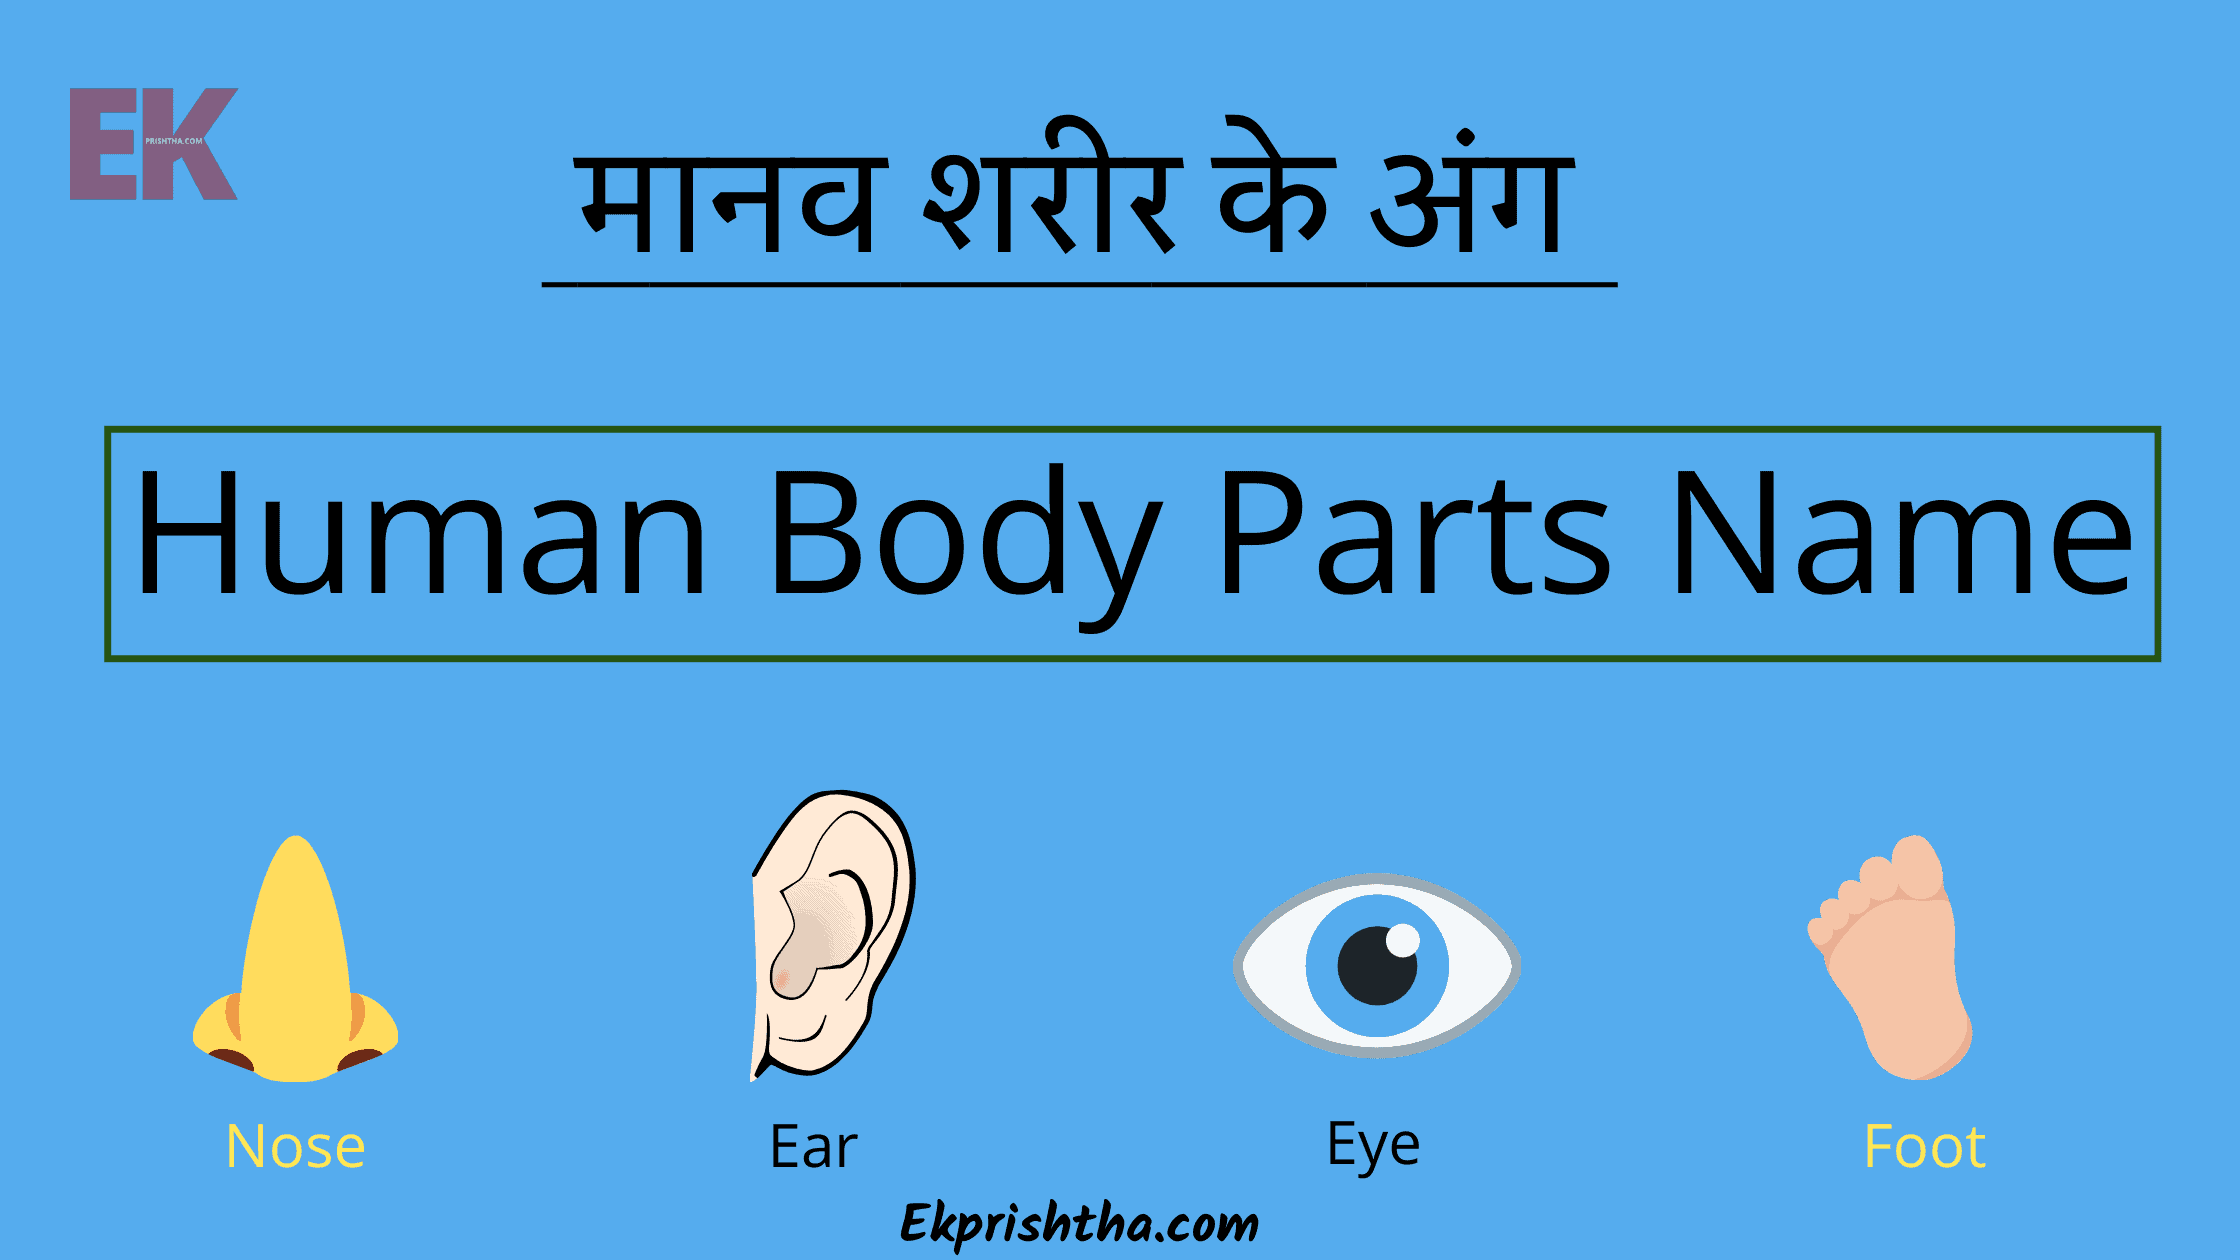 Human Body Parts Name